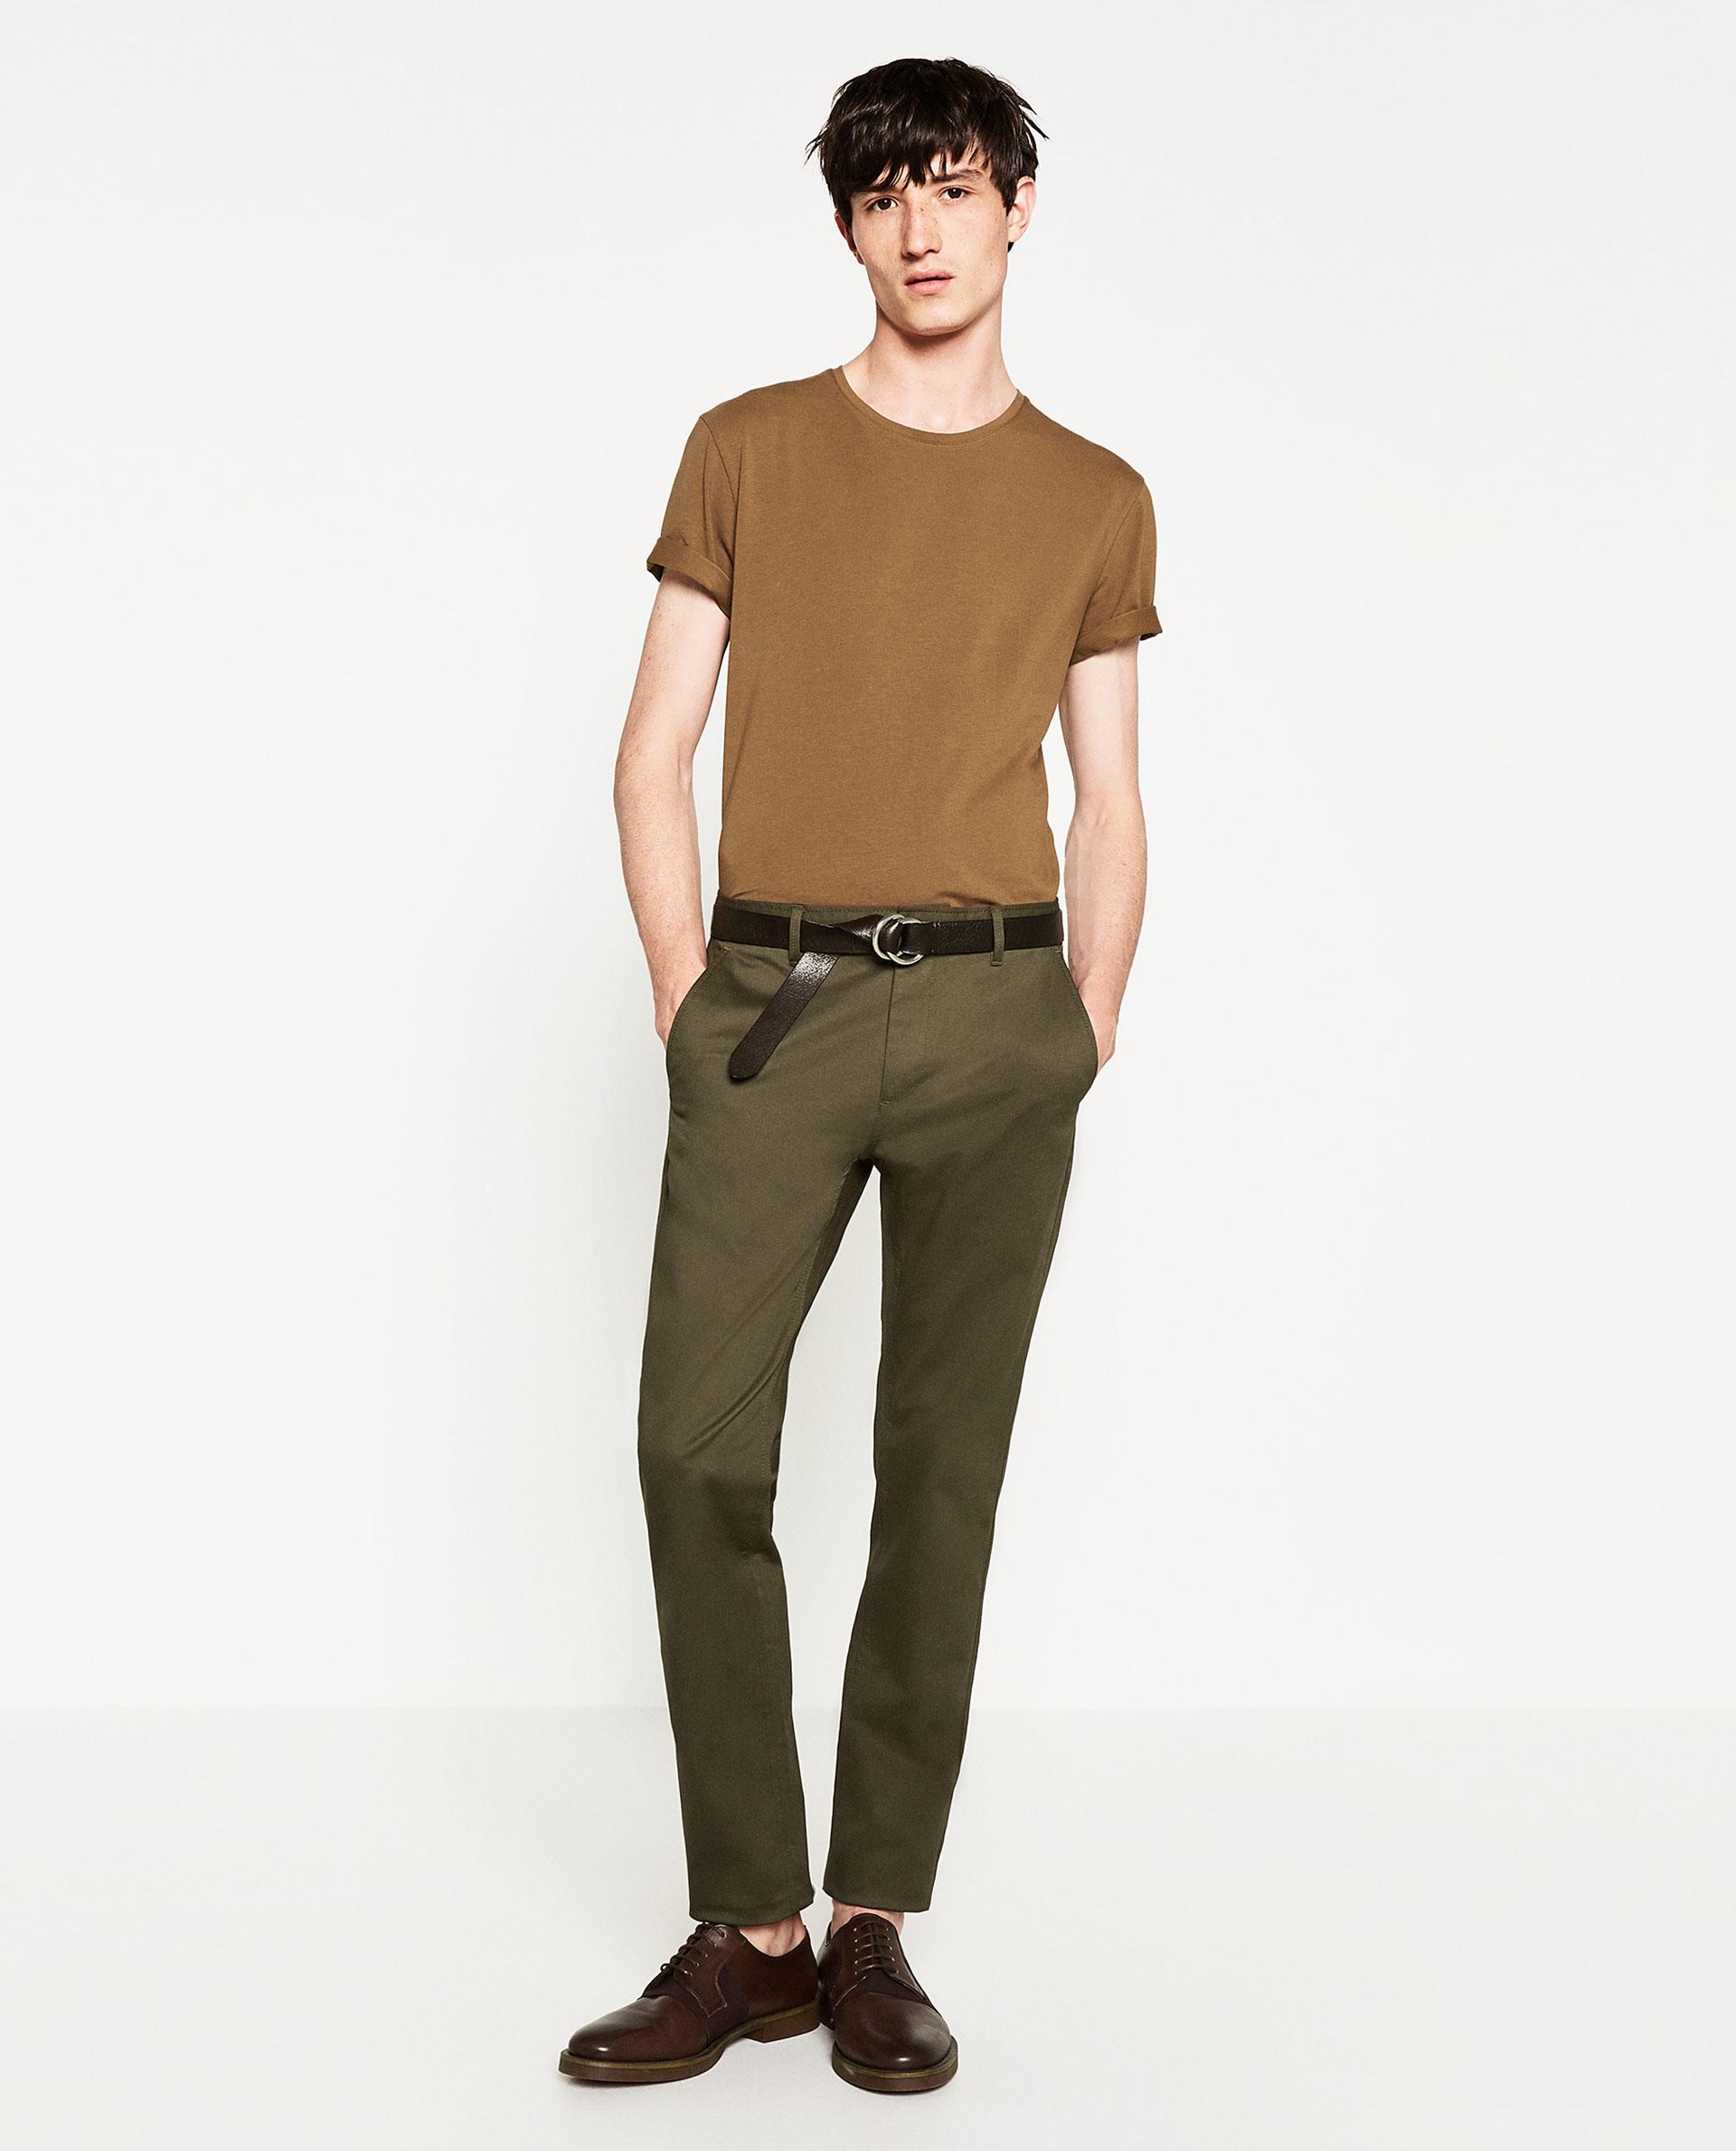 Zara super slim fit t shirt for men lyst for Super slim dress shirts